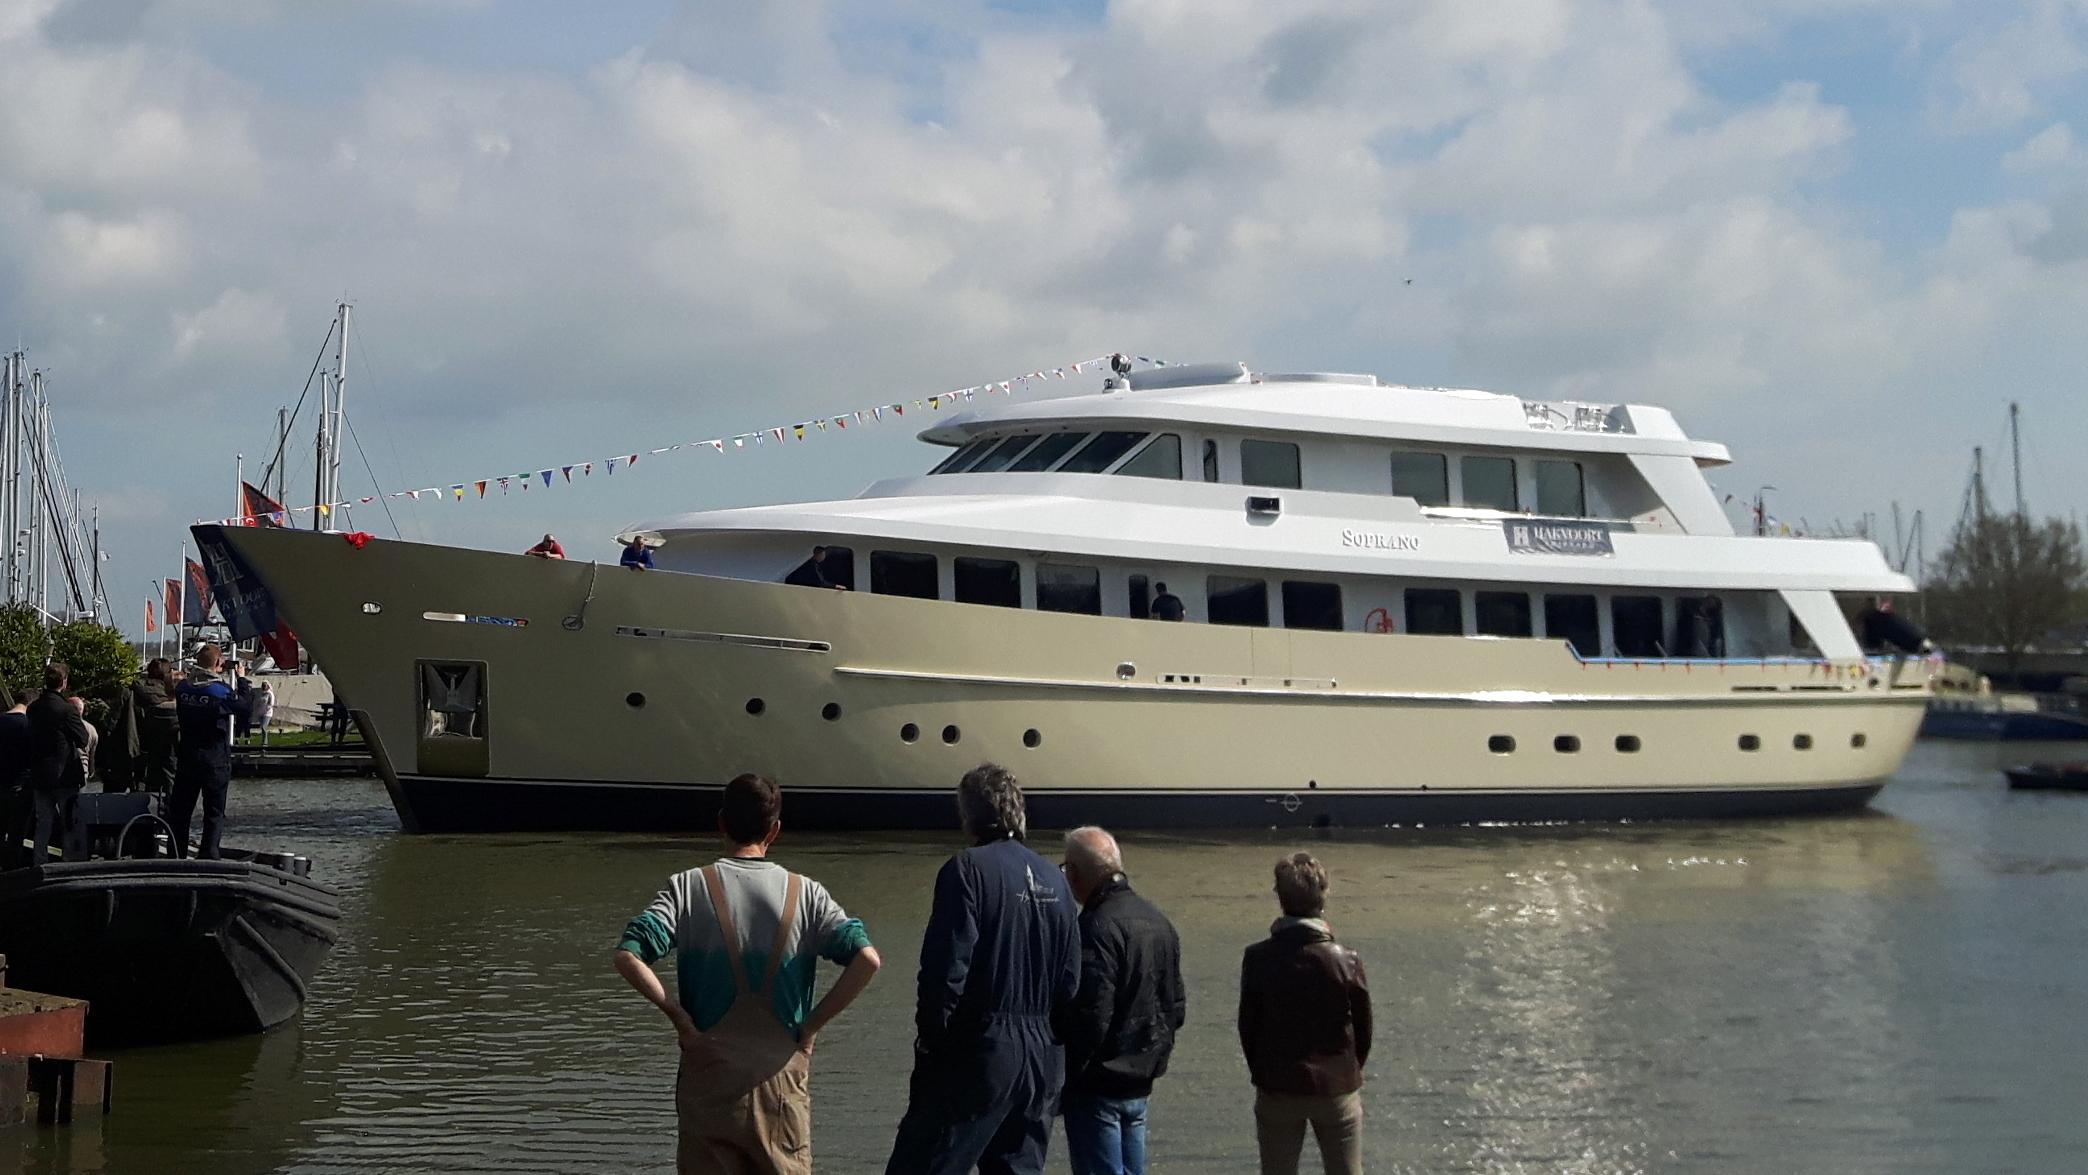 soprano motoryacht hakvoort 38m 2017 launch